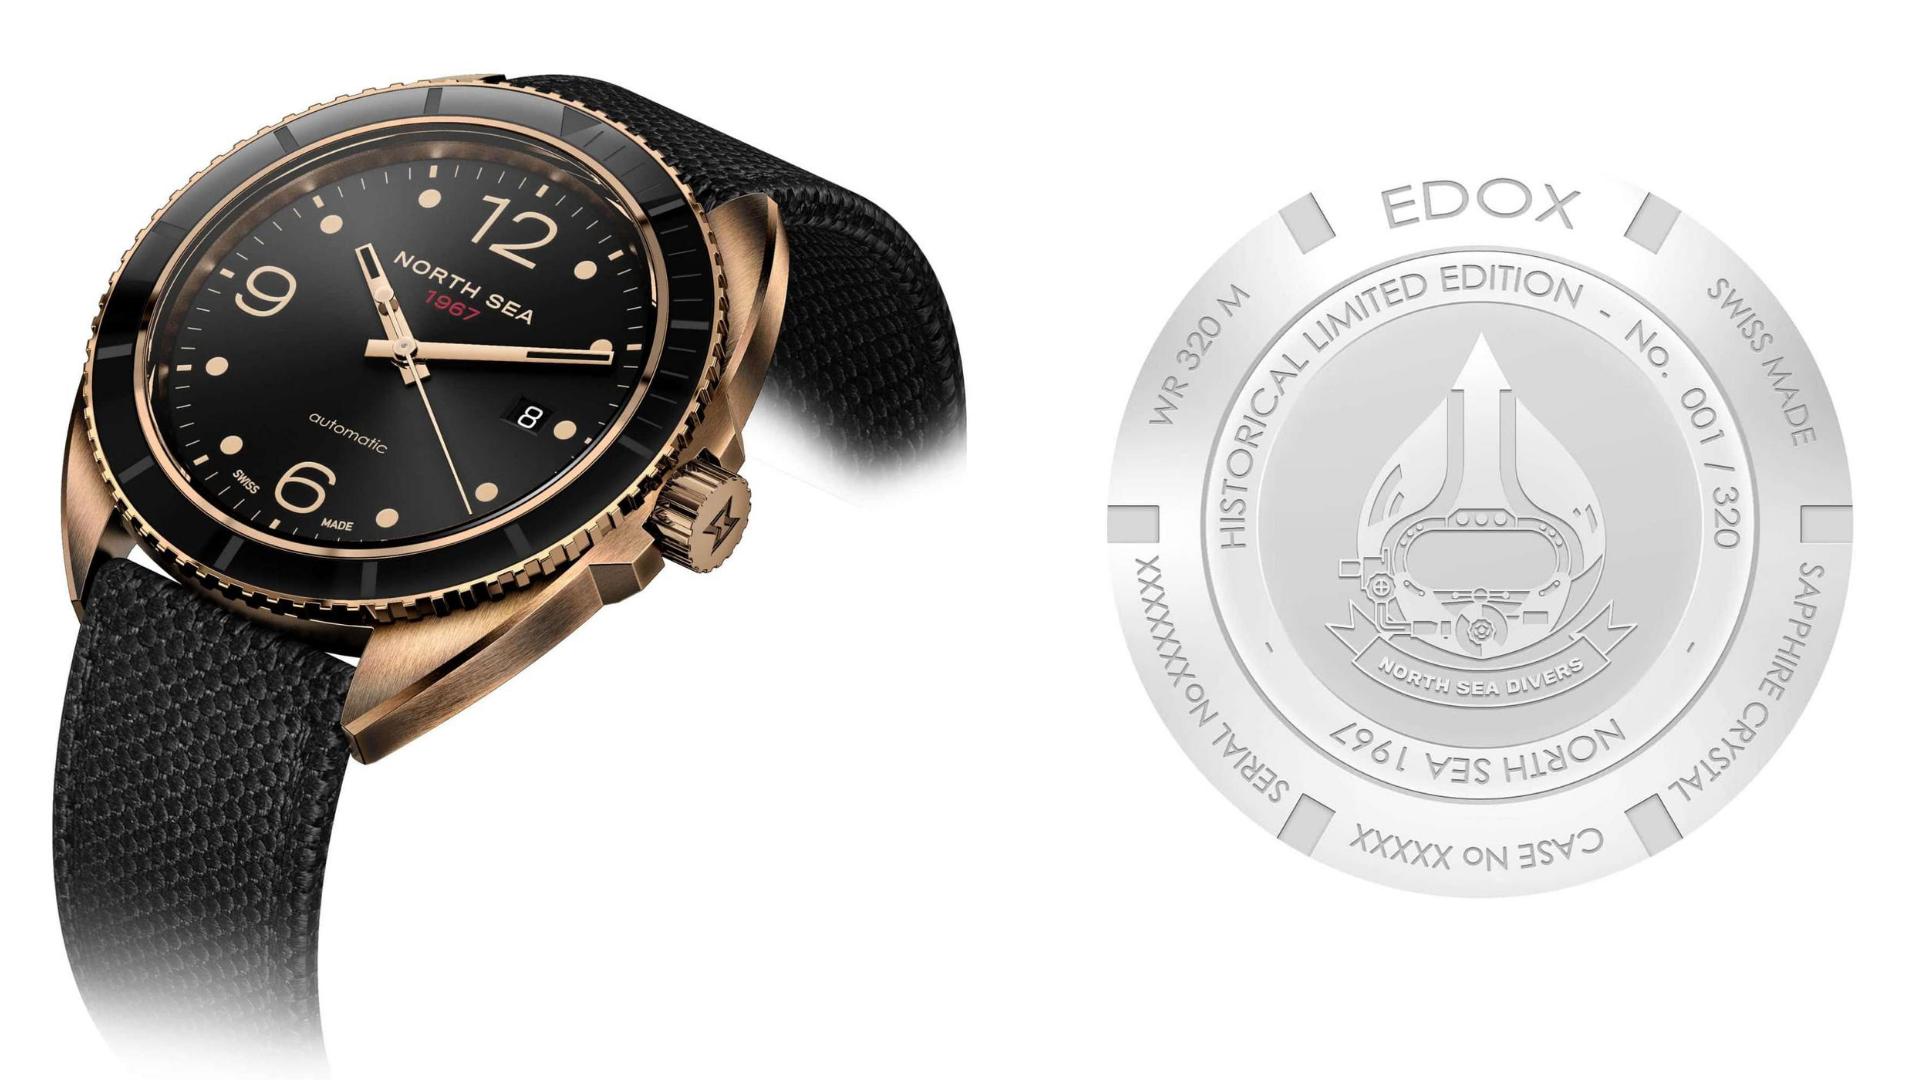 Edox North Sea 1967 Automatic Limited Edition